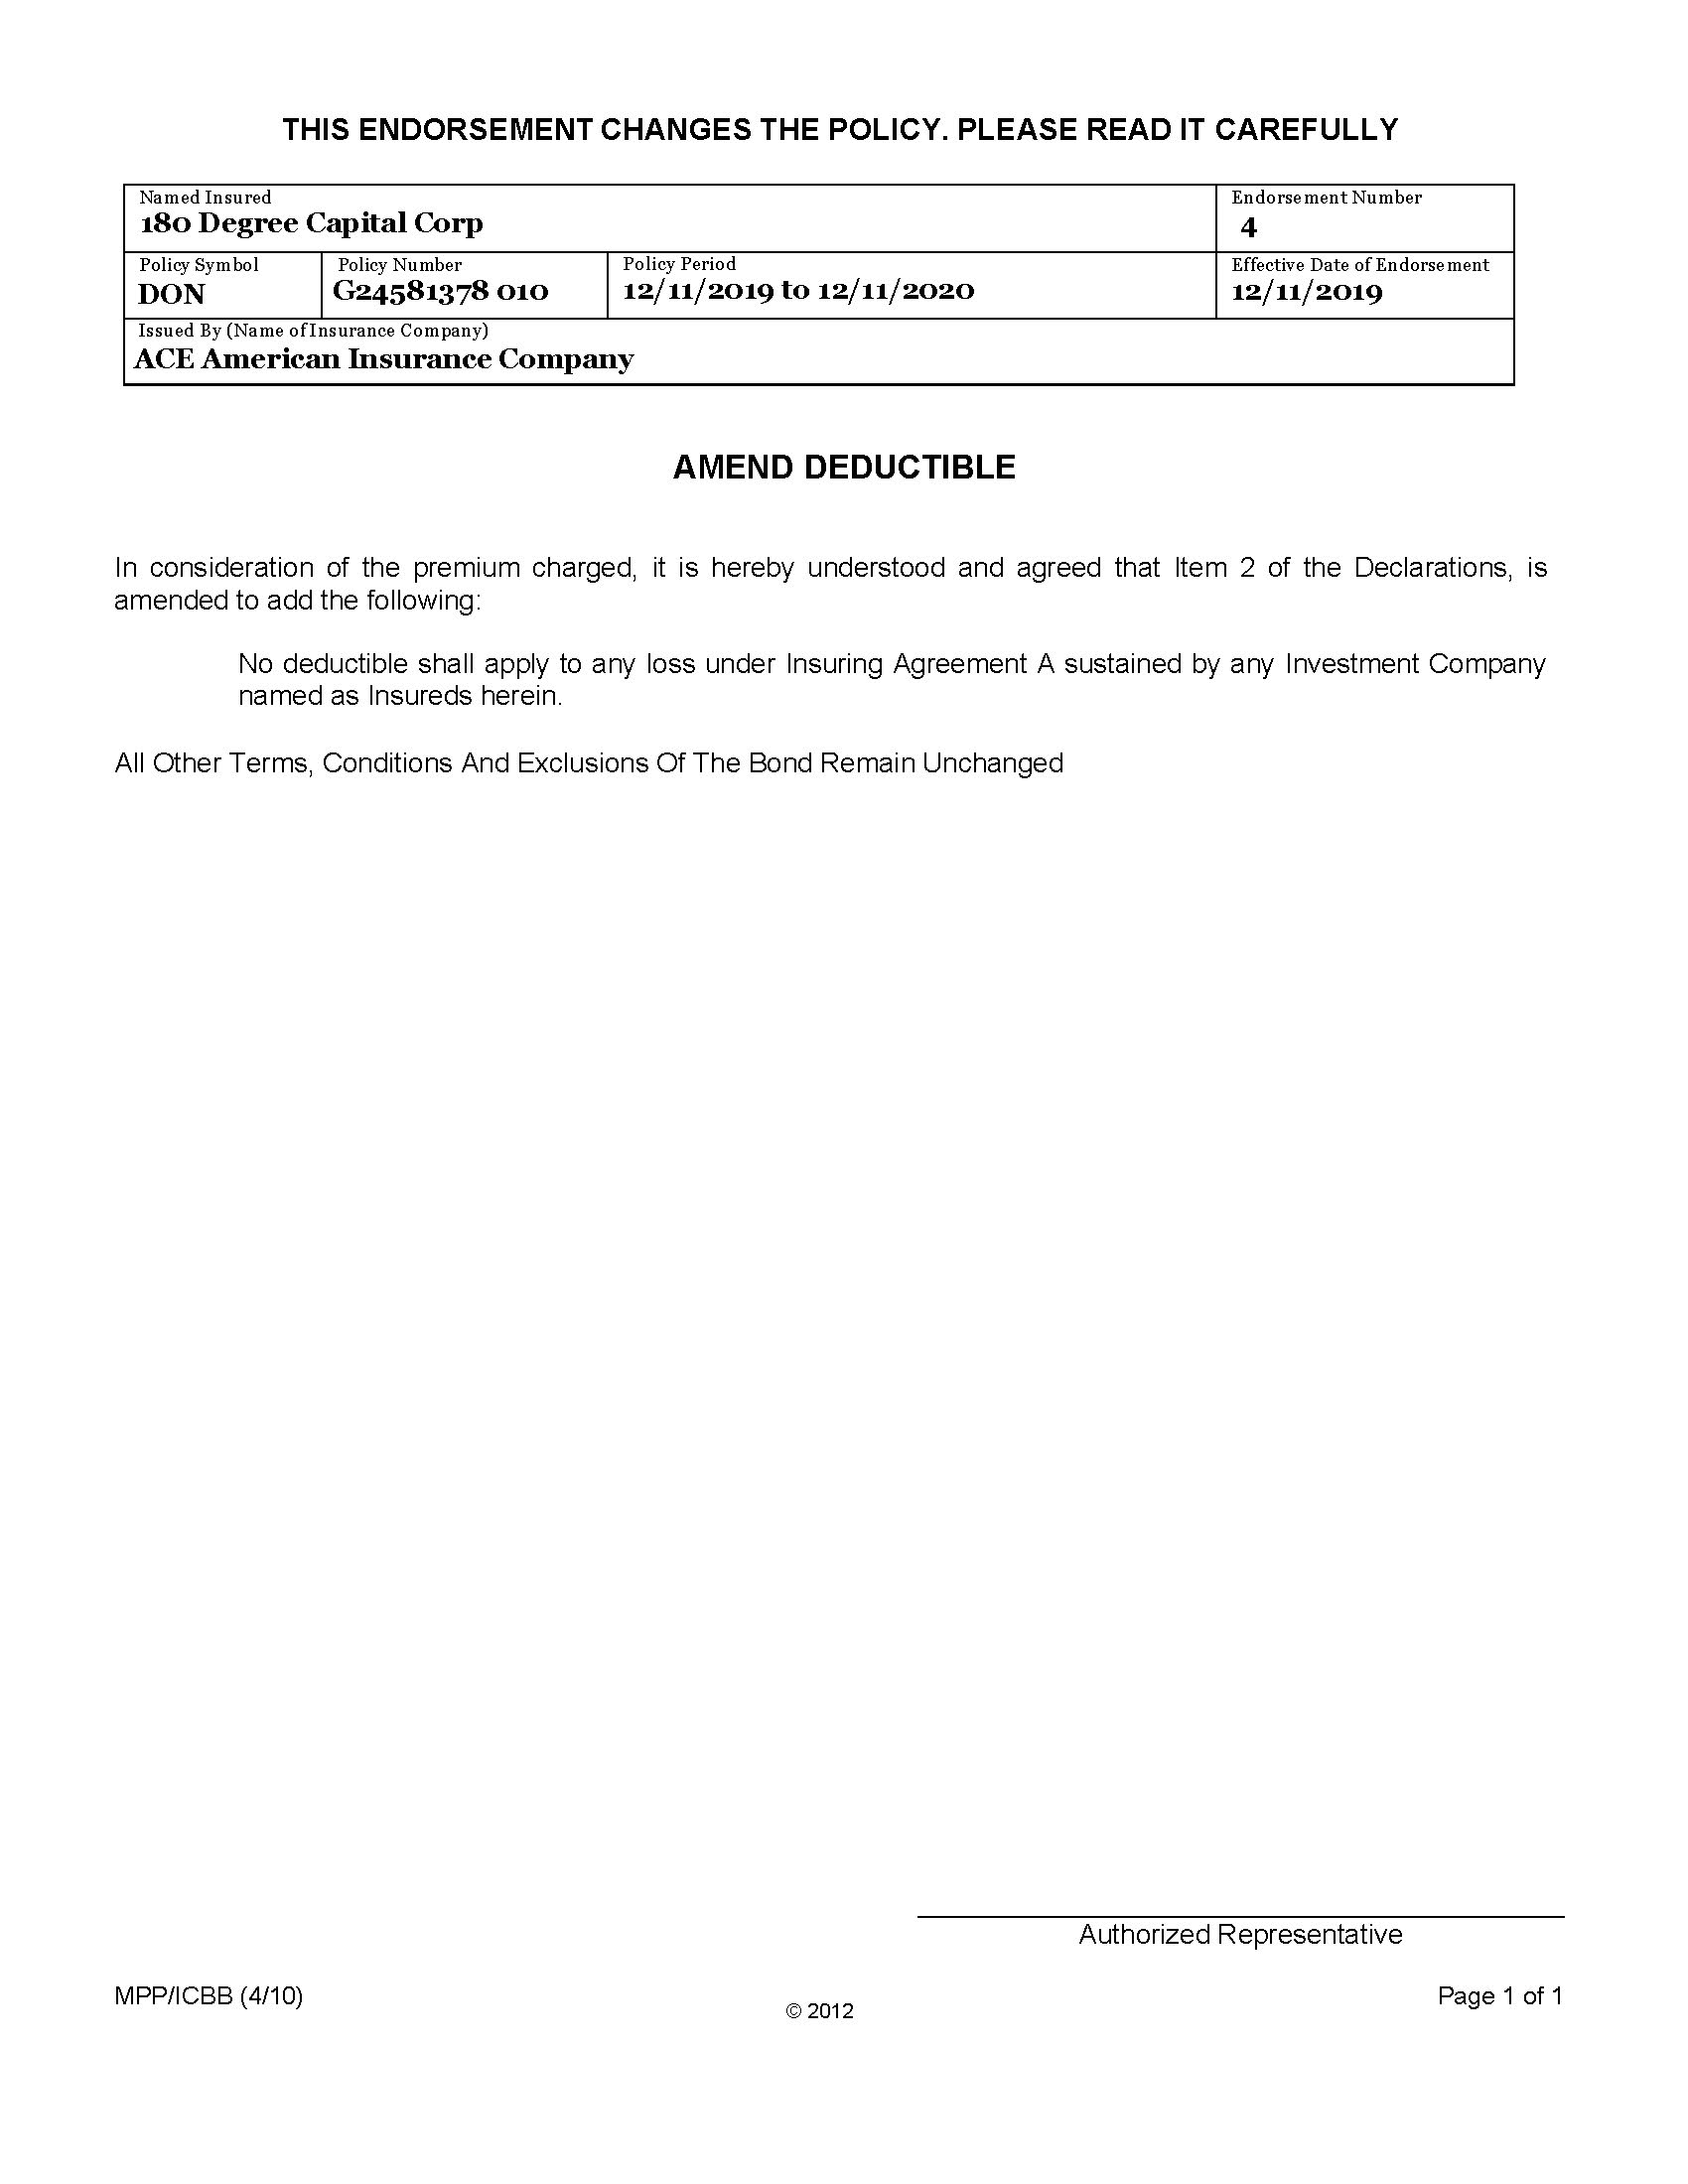 A2019CRIMCHUBBFIBOND33.JPG